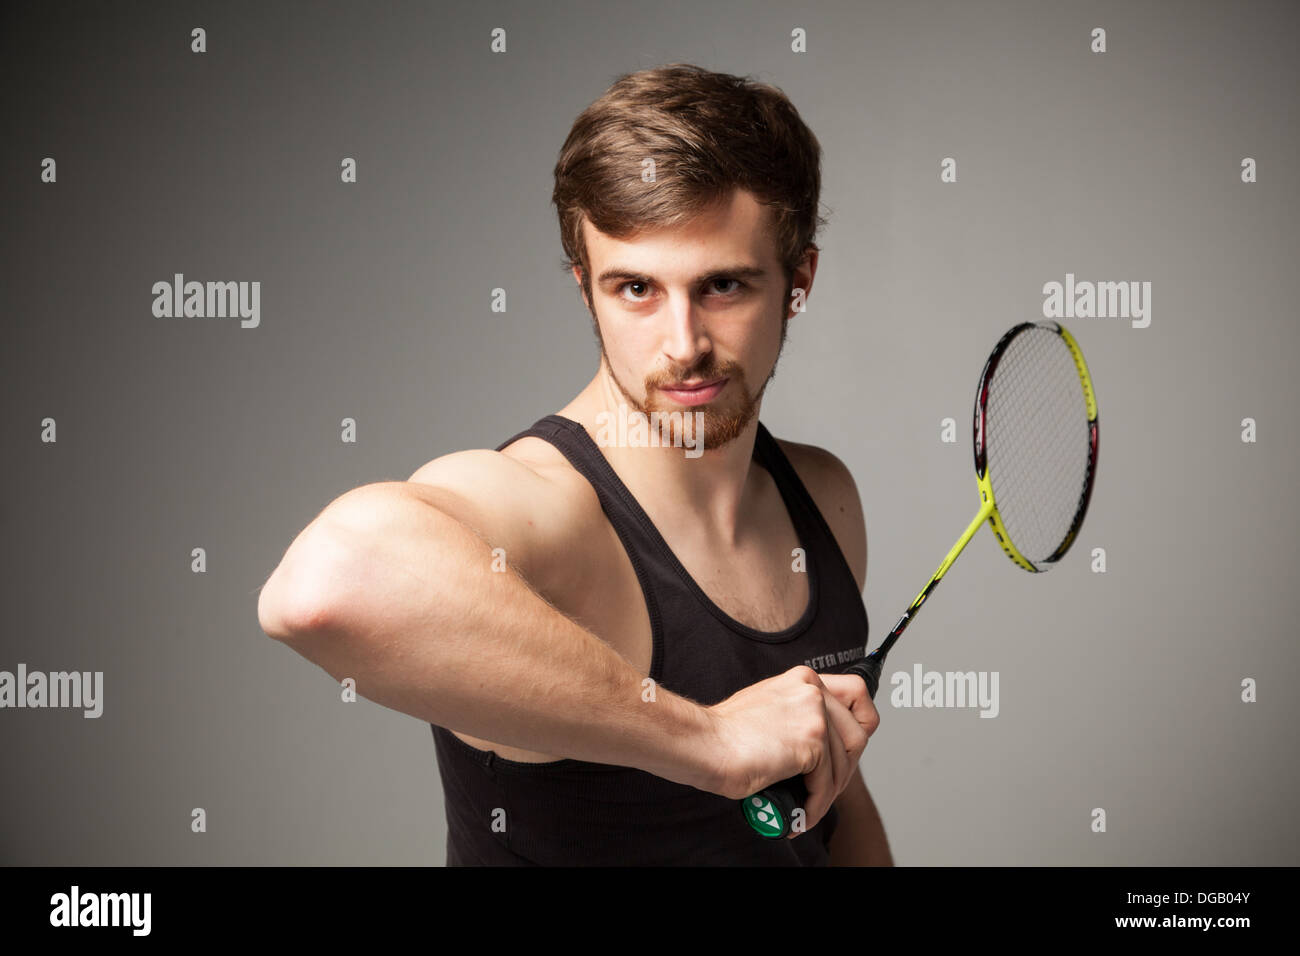 Montare maschio badminton player model Immagini Stock